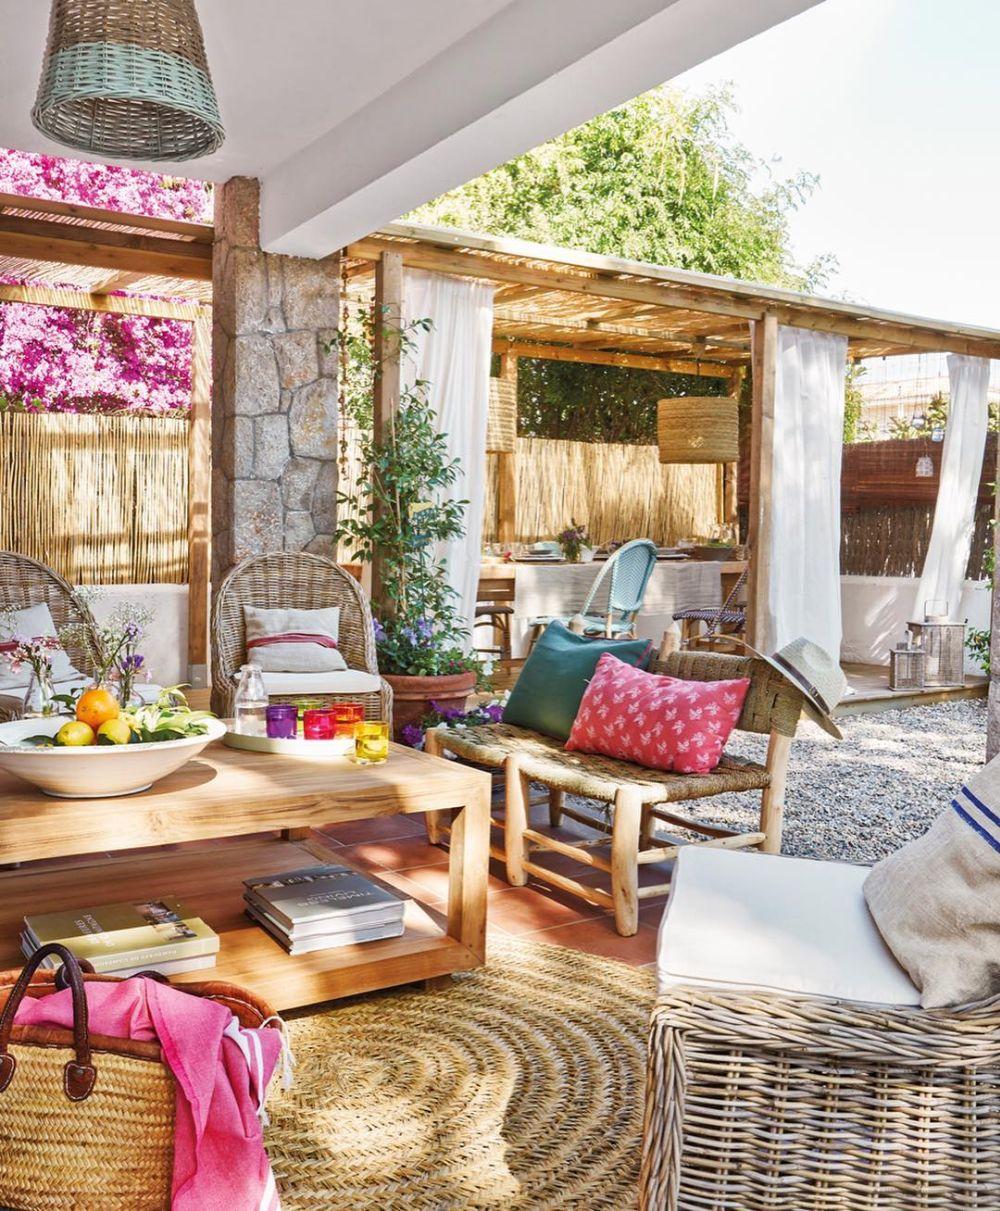 adelaparvu.com despre casa de vacanta, stil rustic mediteranean, designer Teresa Asensio, Foto Jordi Canosa (11)